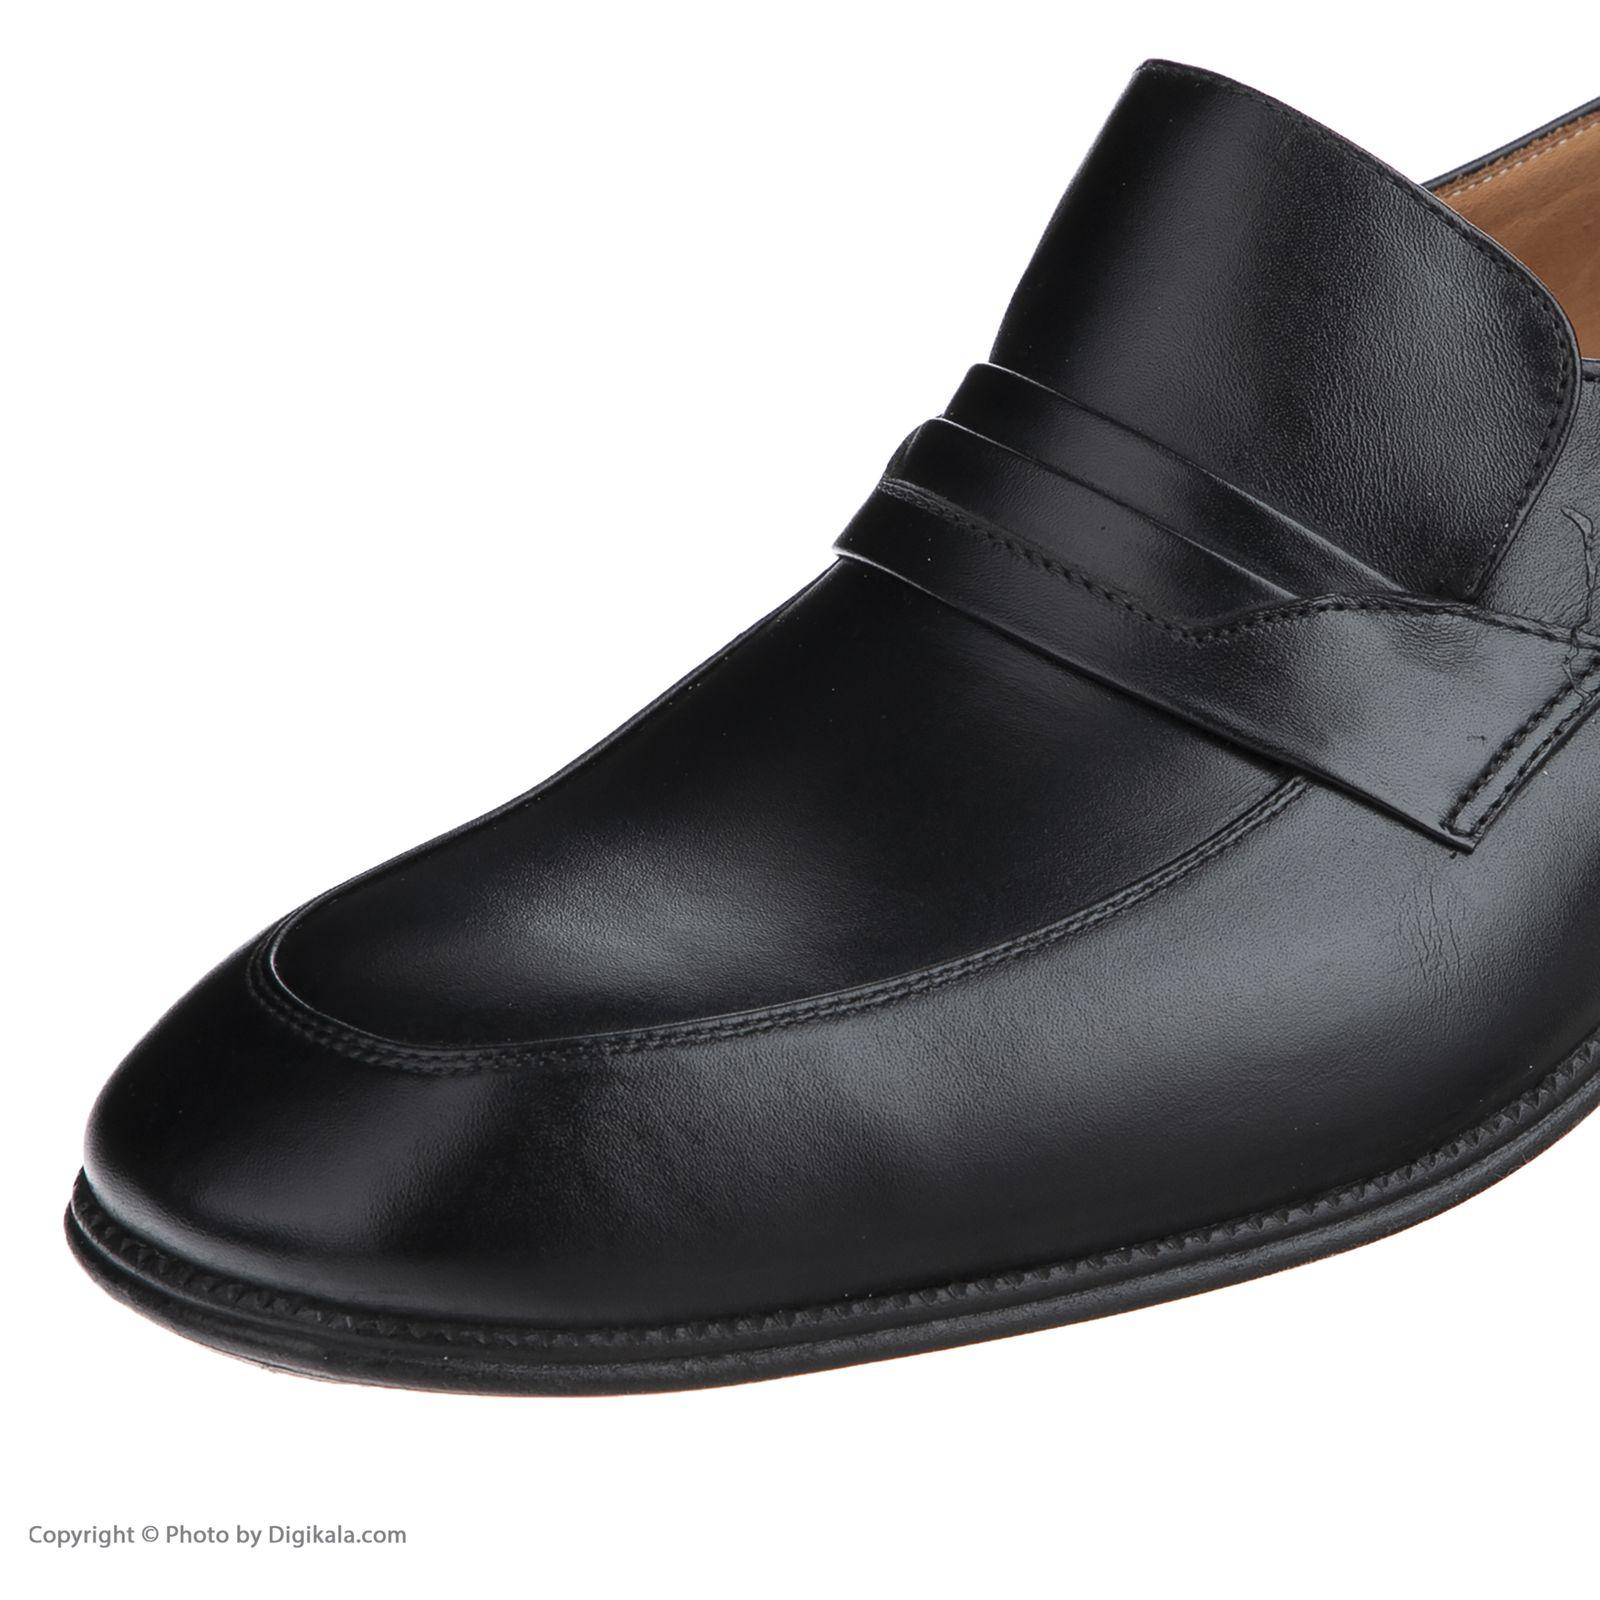 کفش مردانه نظری کد 416 -  - 6